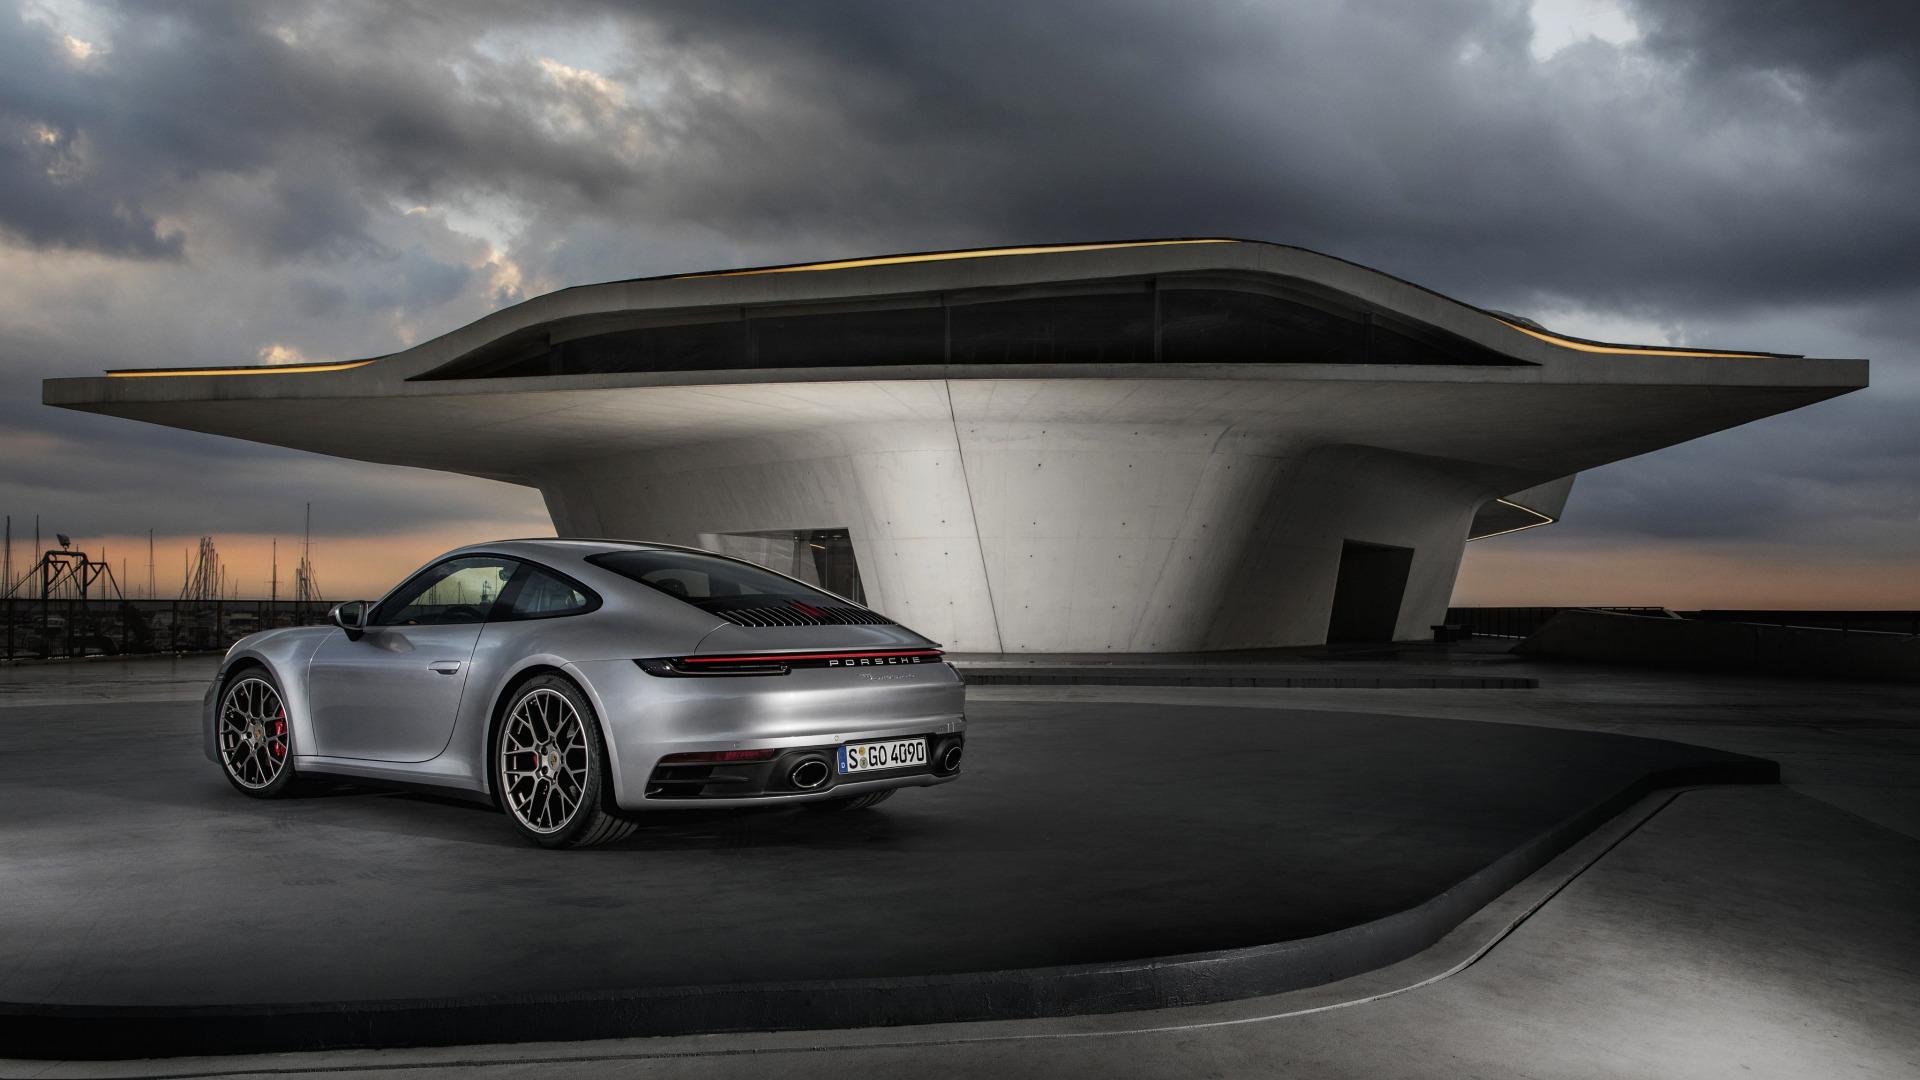 Wallpaper Vehicle Urban Porsche 911 Carrera Clouds Sports Car 2020 Year Architecture Futuristic Building 1920x1080 Andrev321 1552907 Hd Wallpapers Wallhere